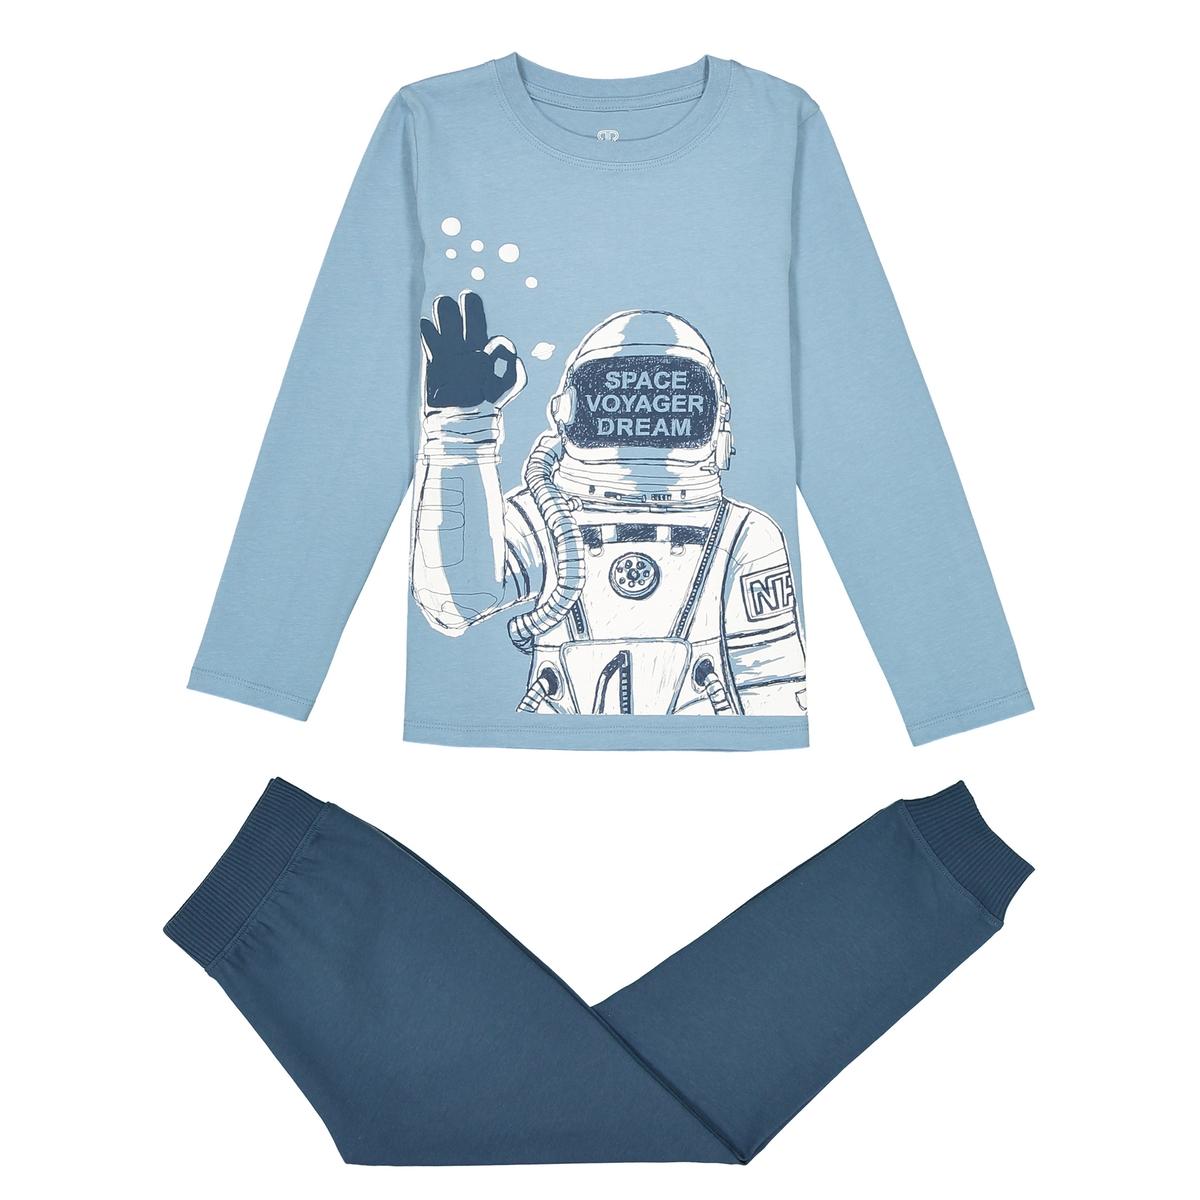 Пижама из хлопка астронавт 2-12 лет